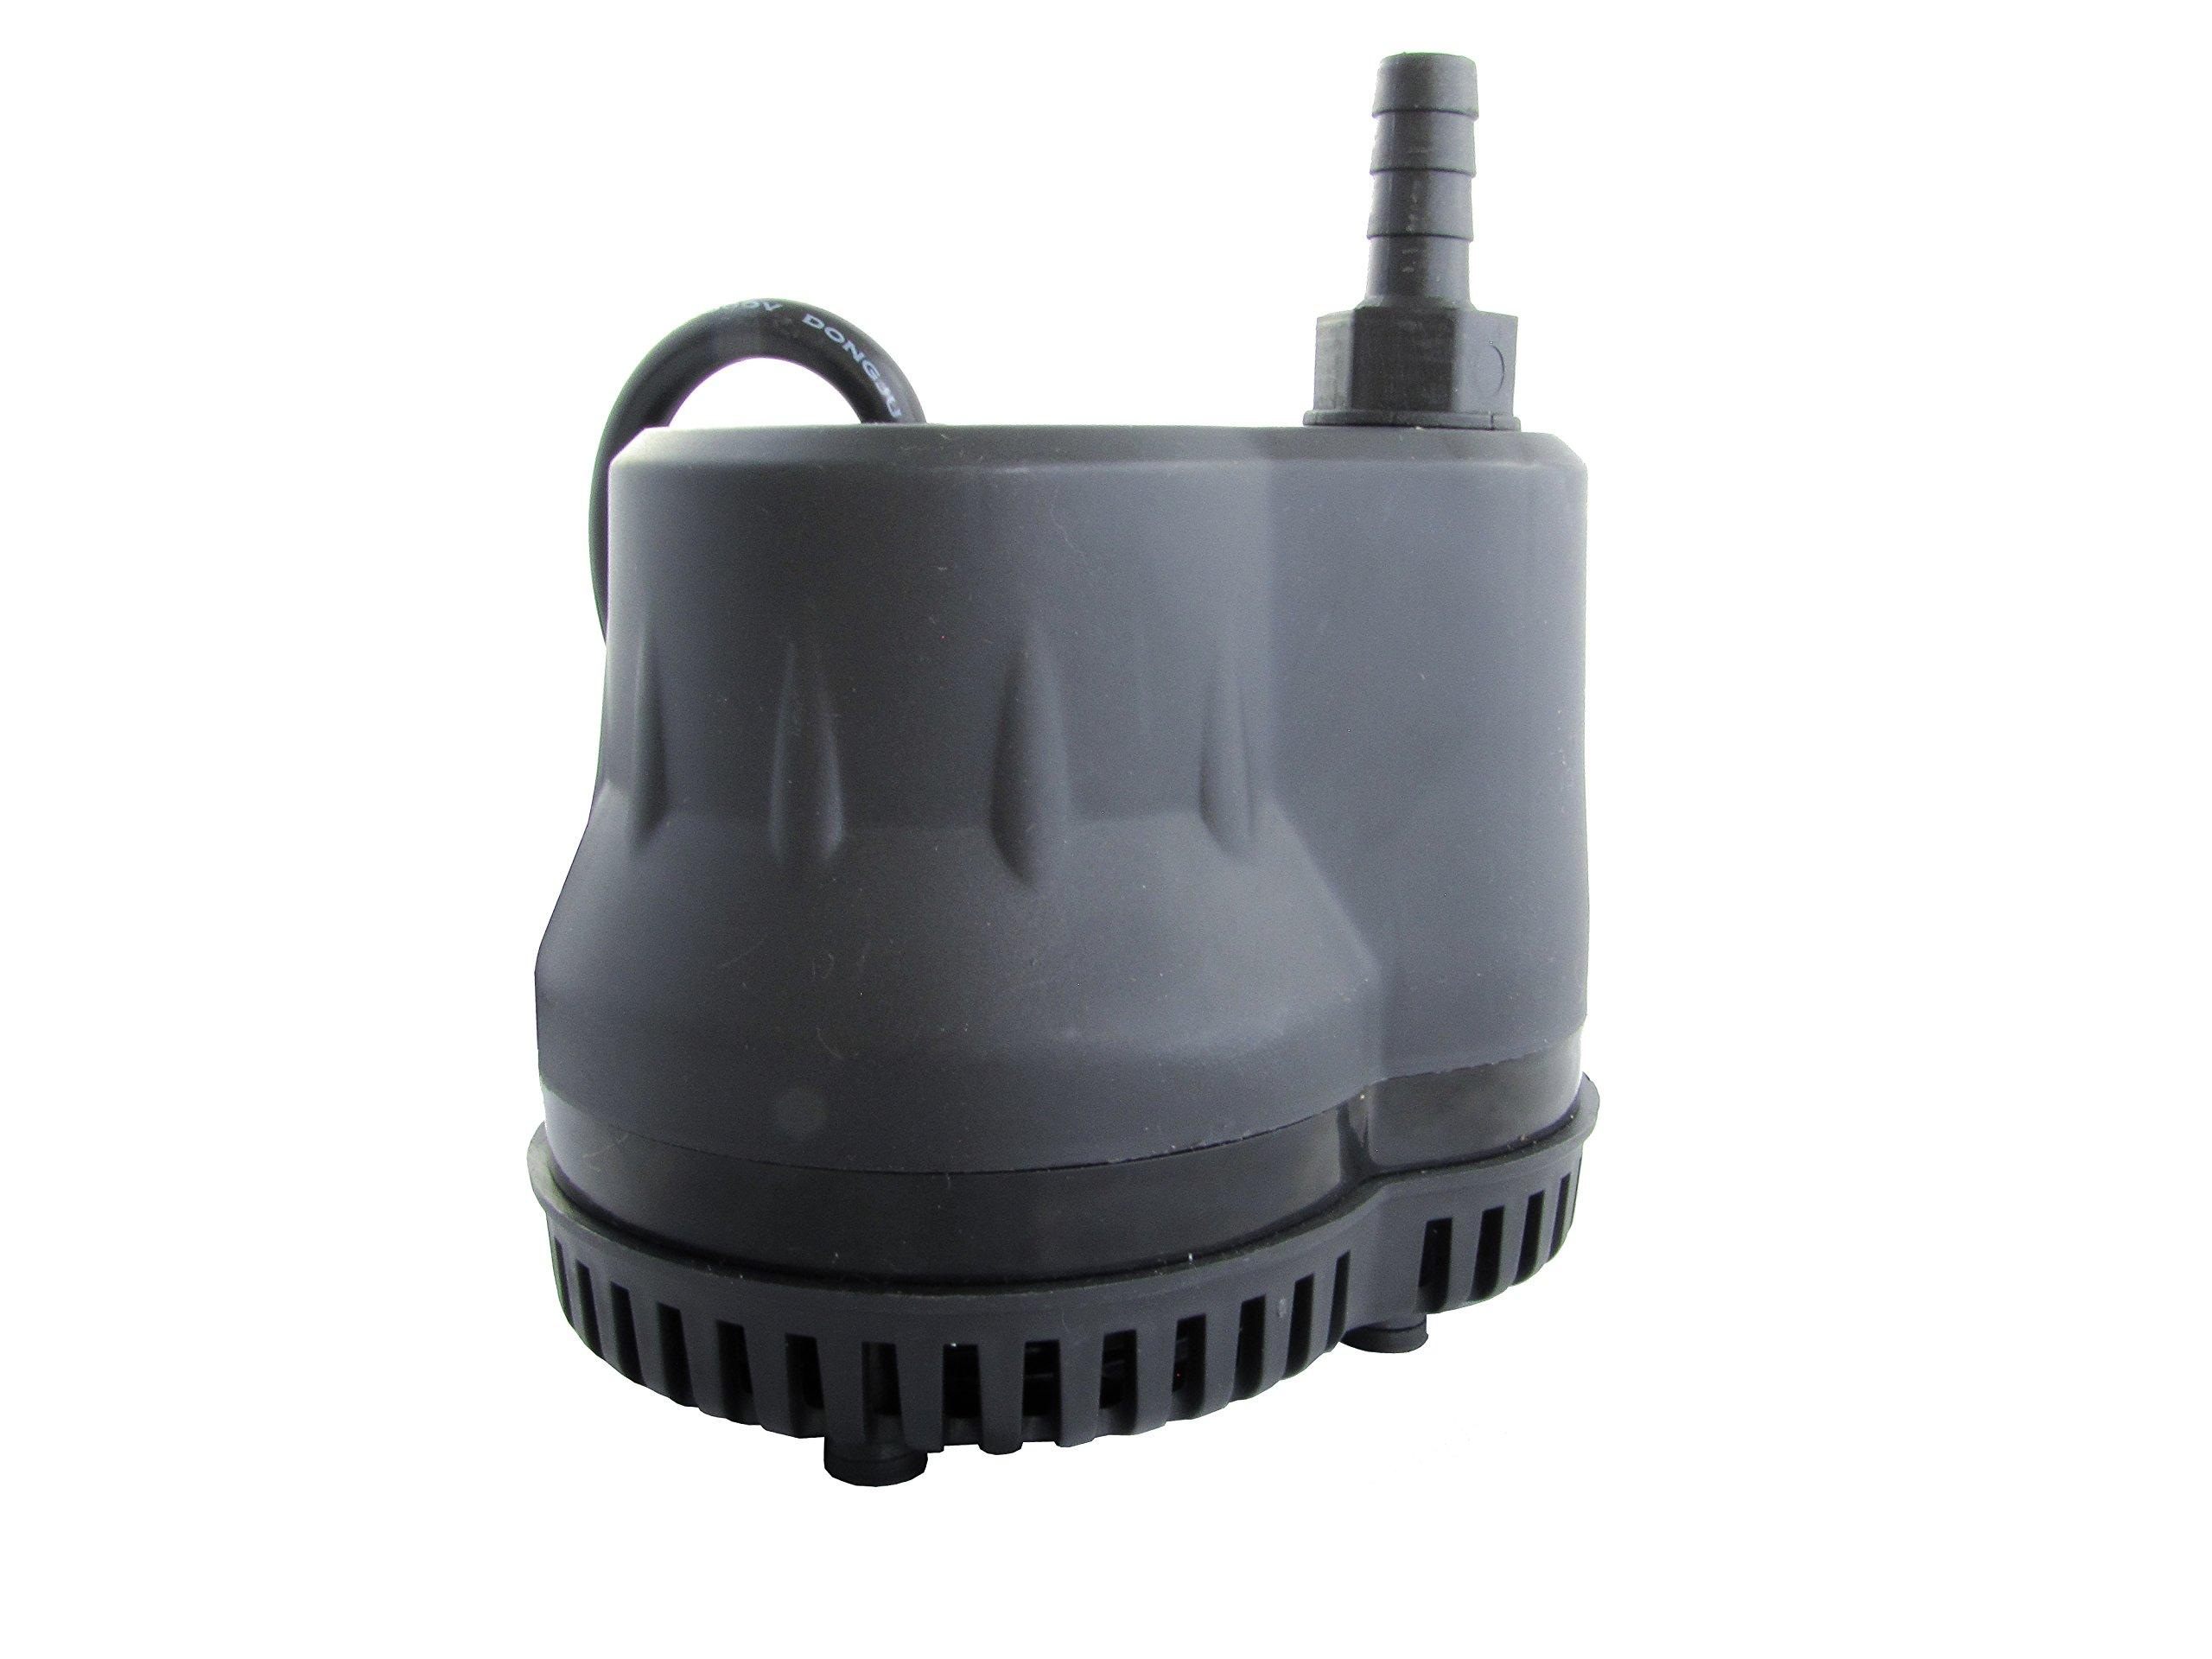 Fibropool Electric Swimming Pool Winter Cover Drain Pump